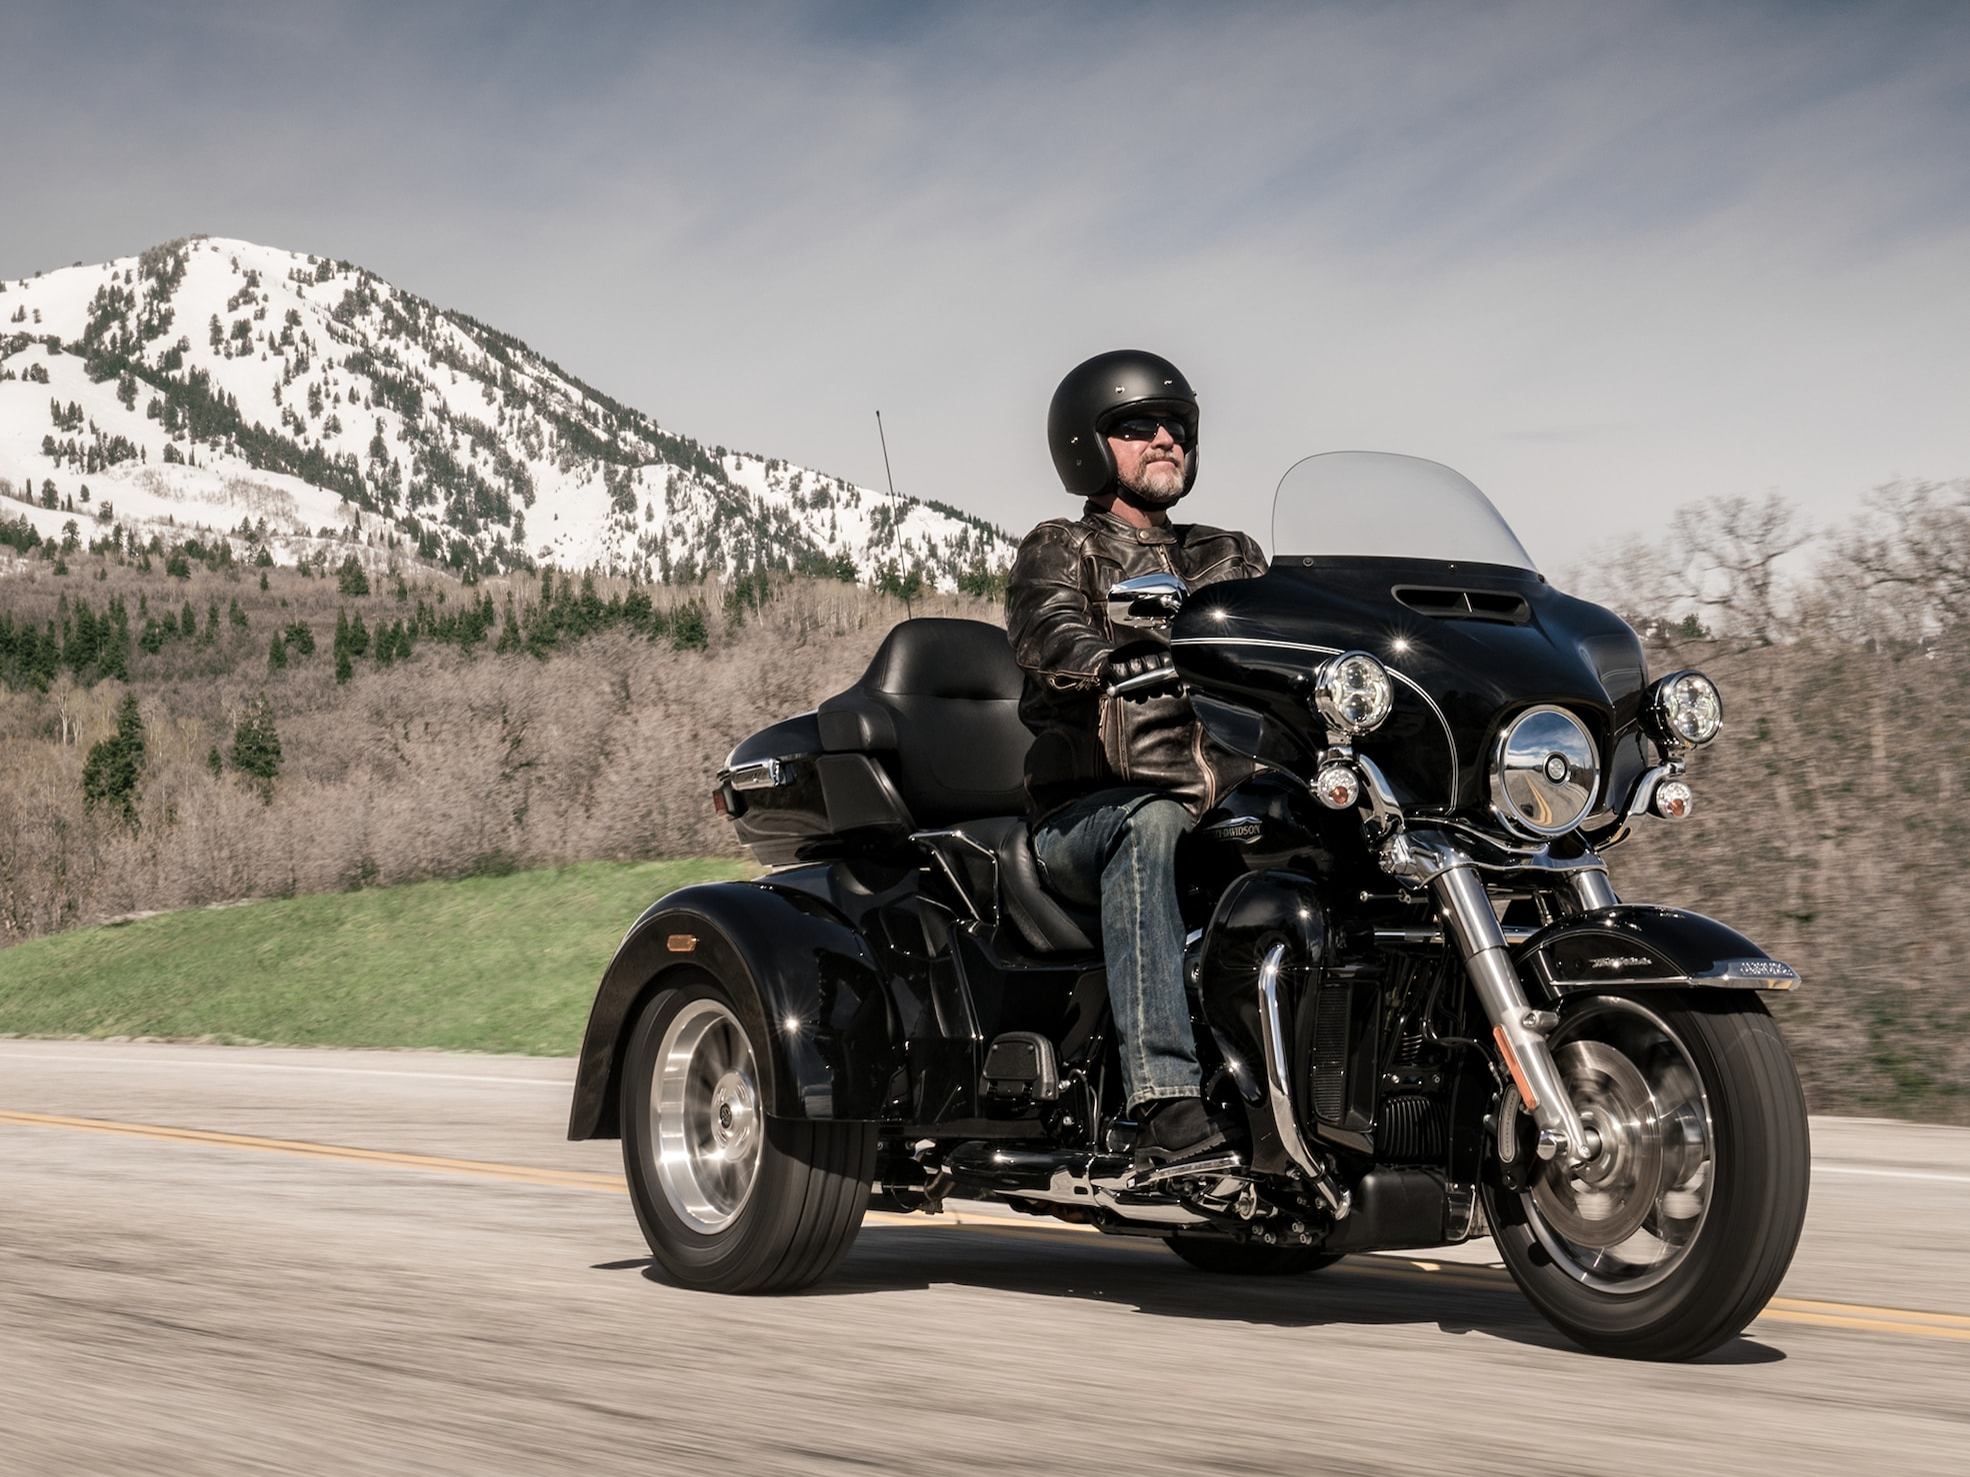 2018 Tri Glide Ultra Harley Davidson: Harley-Davidson France